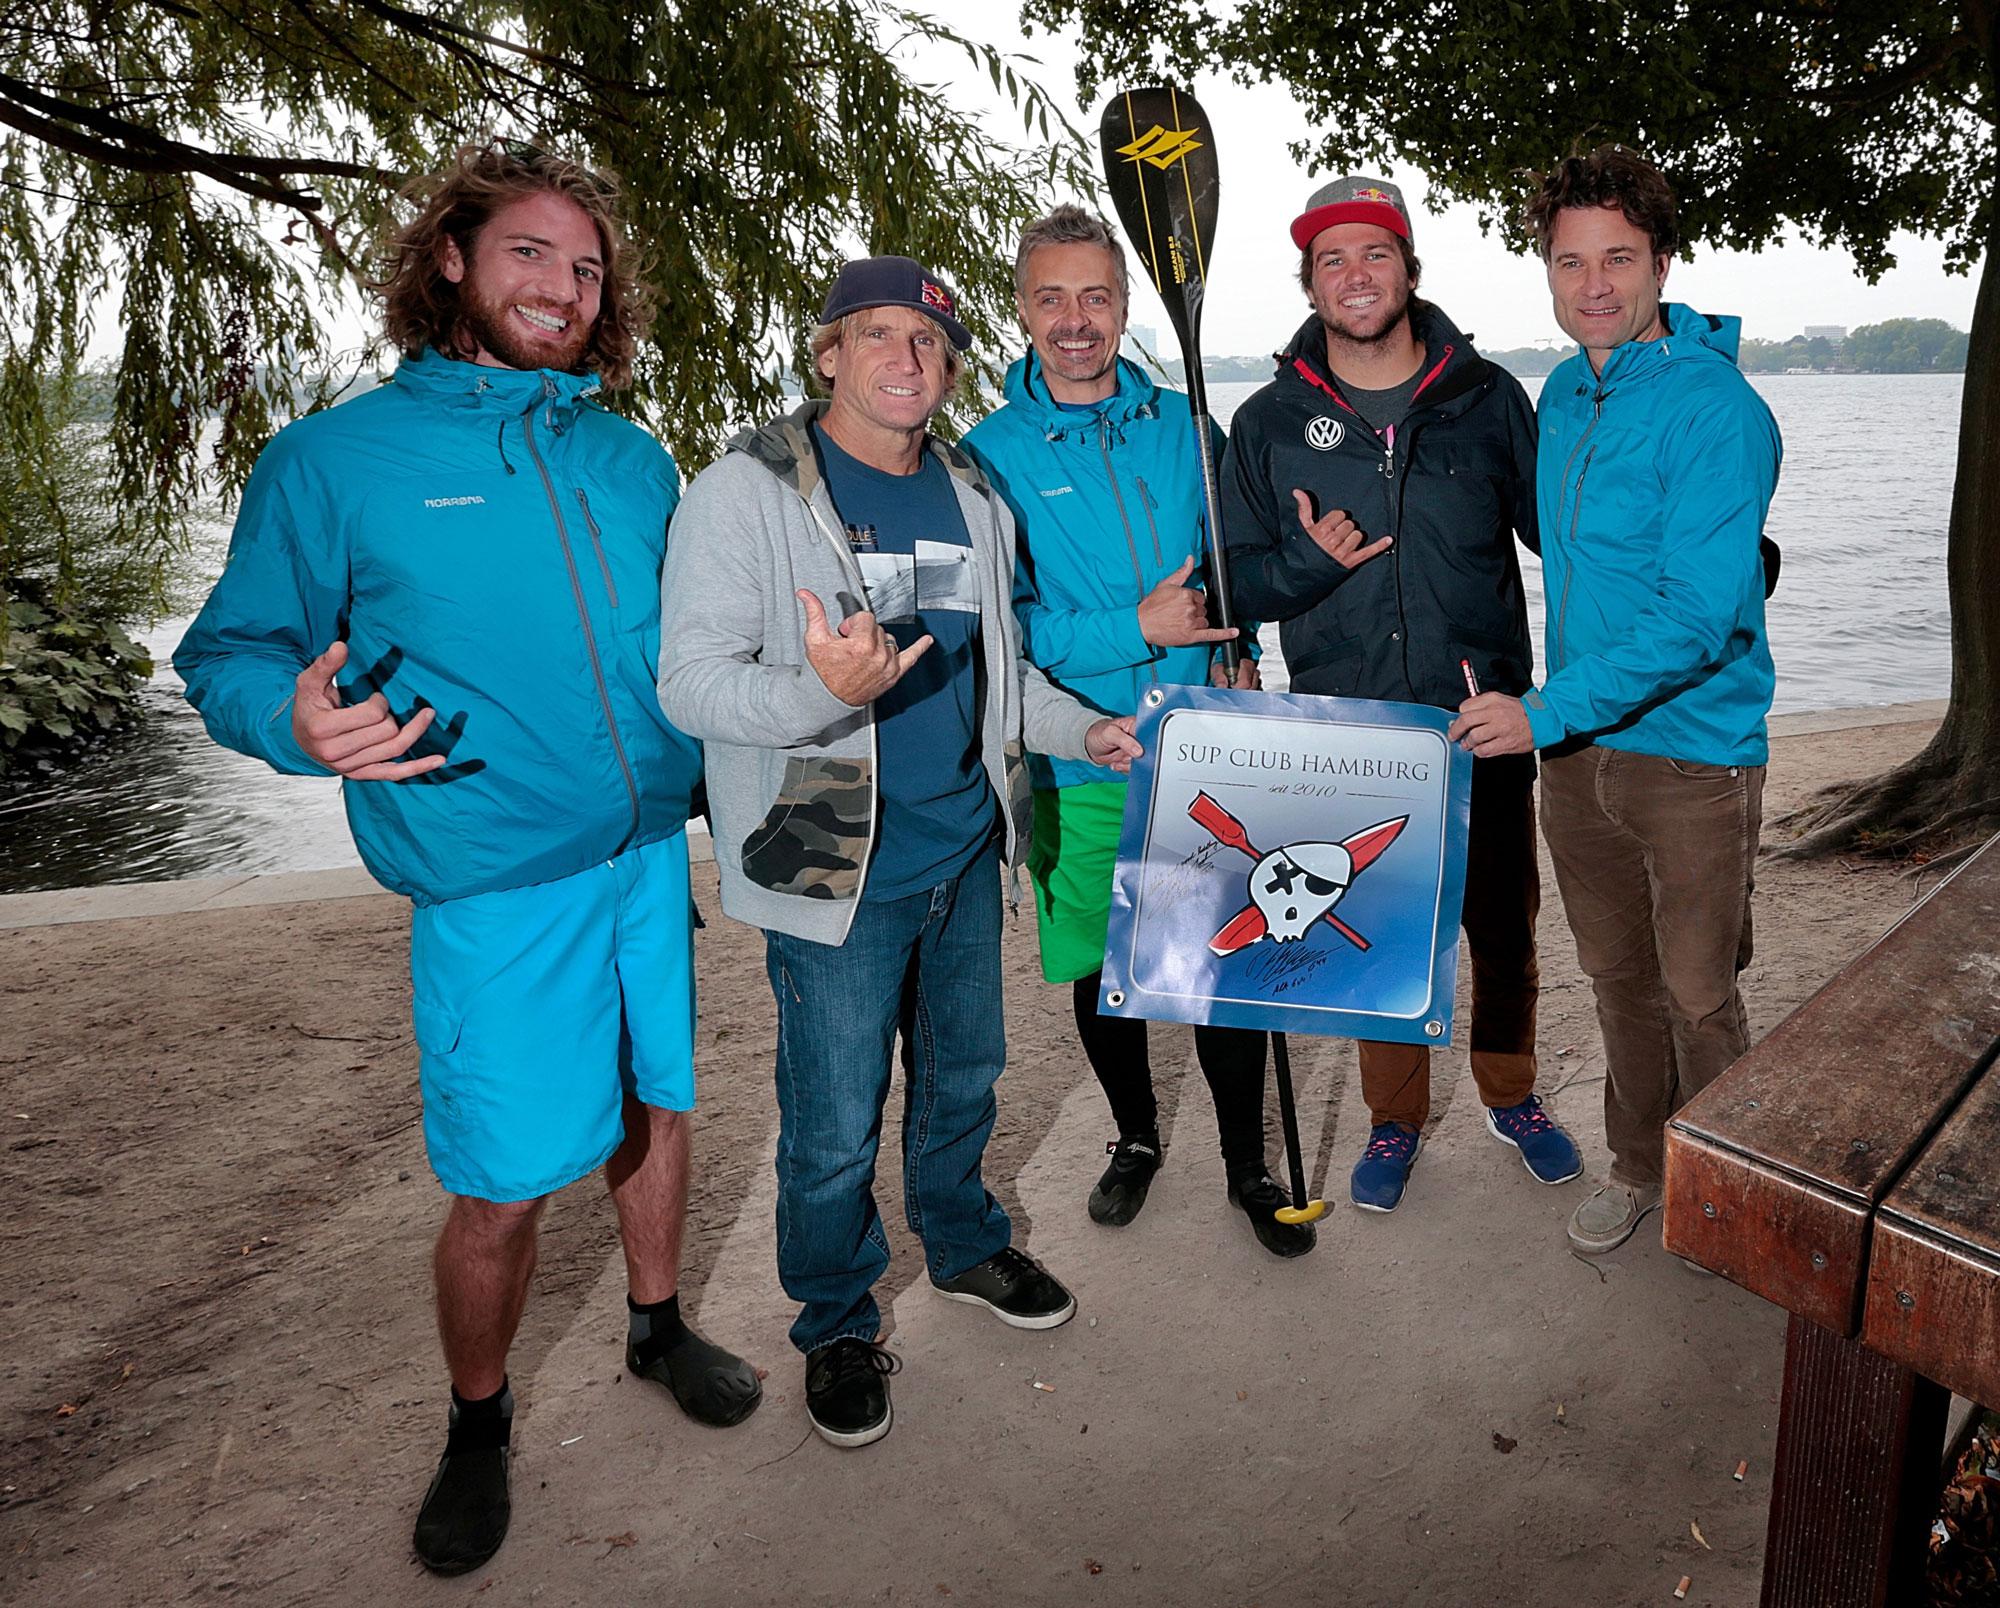 Robby Naish und Philip Köster mit SUP CLUB Hamburg Coaches Bene Henning Philipp C: SportBILD